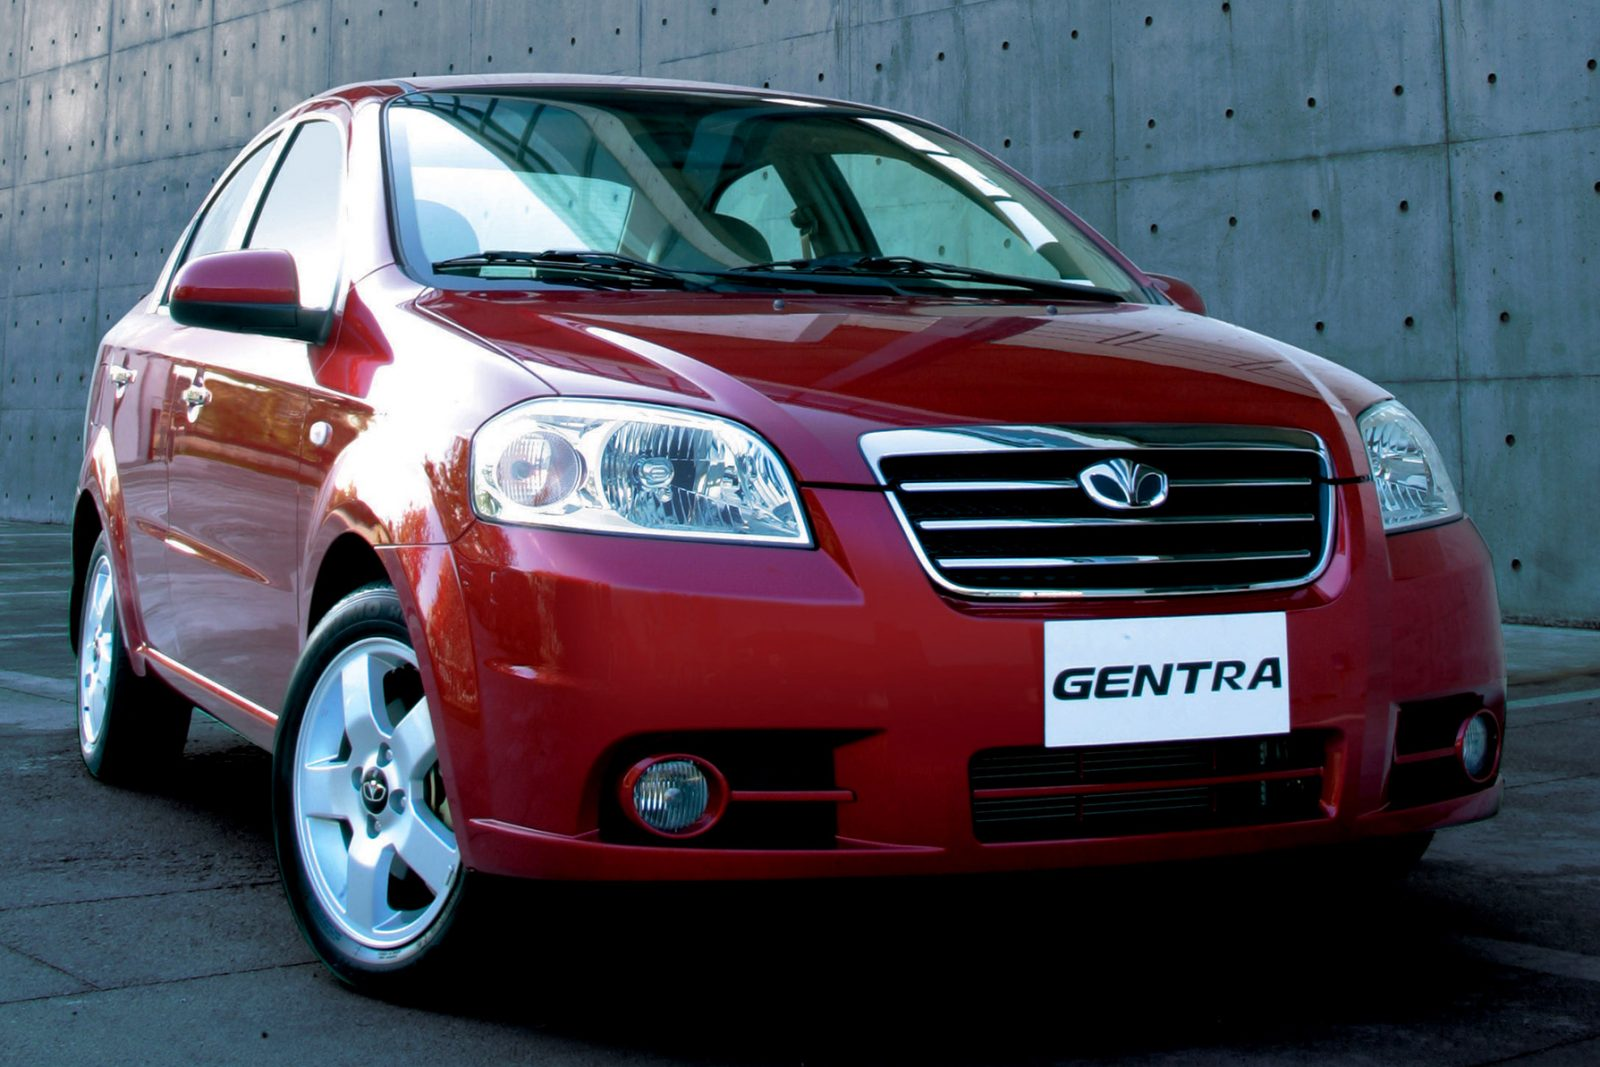 Внешние и технические характеристики Daewoo Gentra